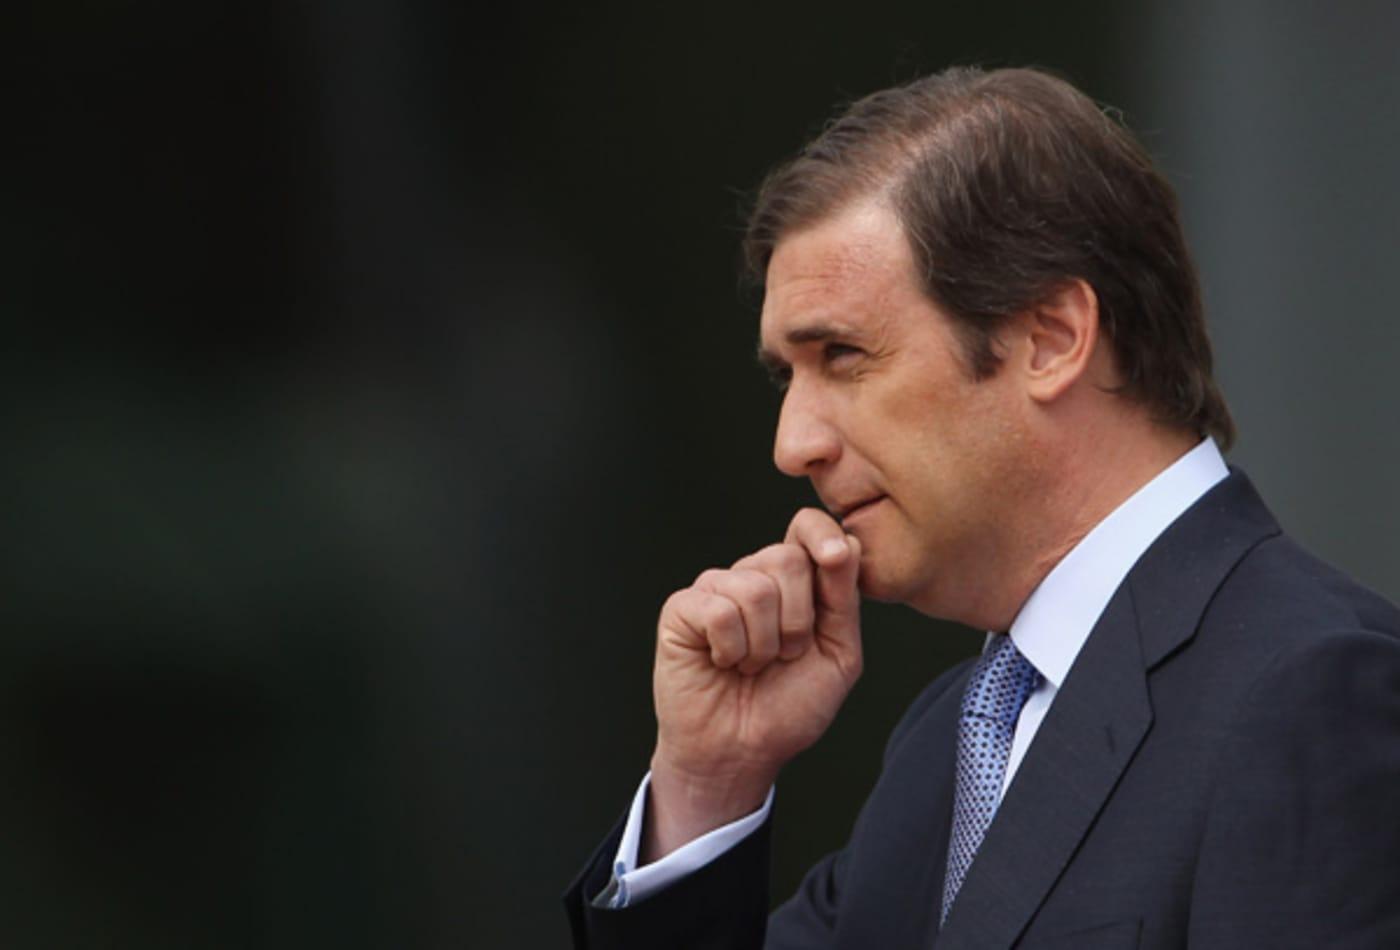 CNBC_Major_Events_Eurozone_Coelho.jpg